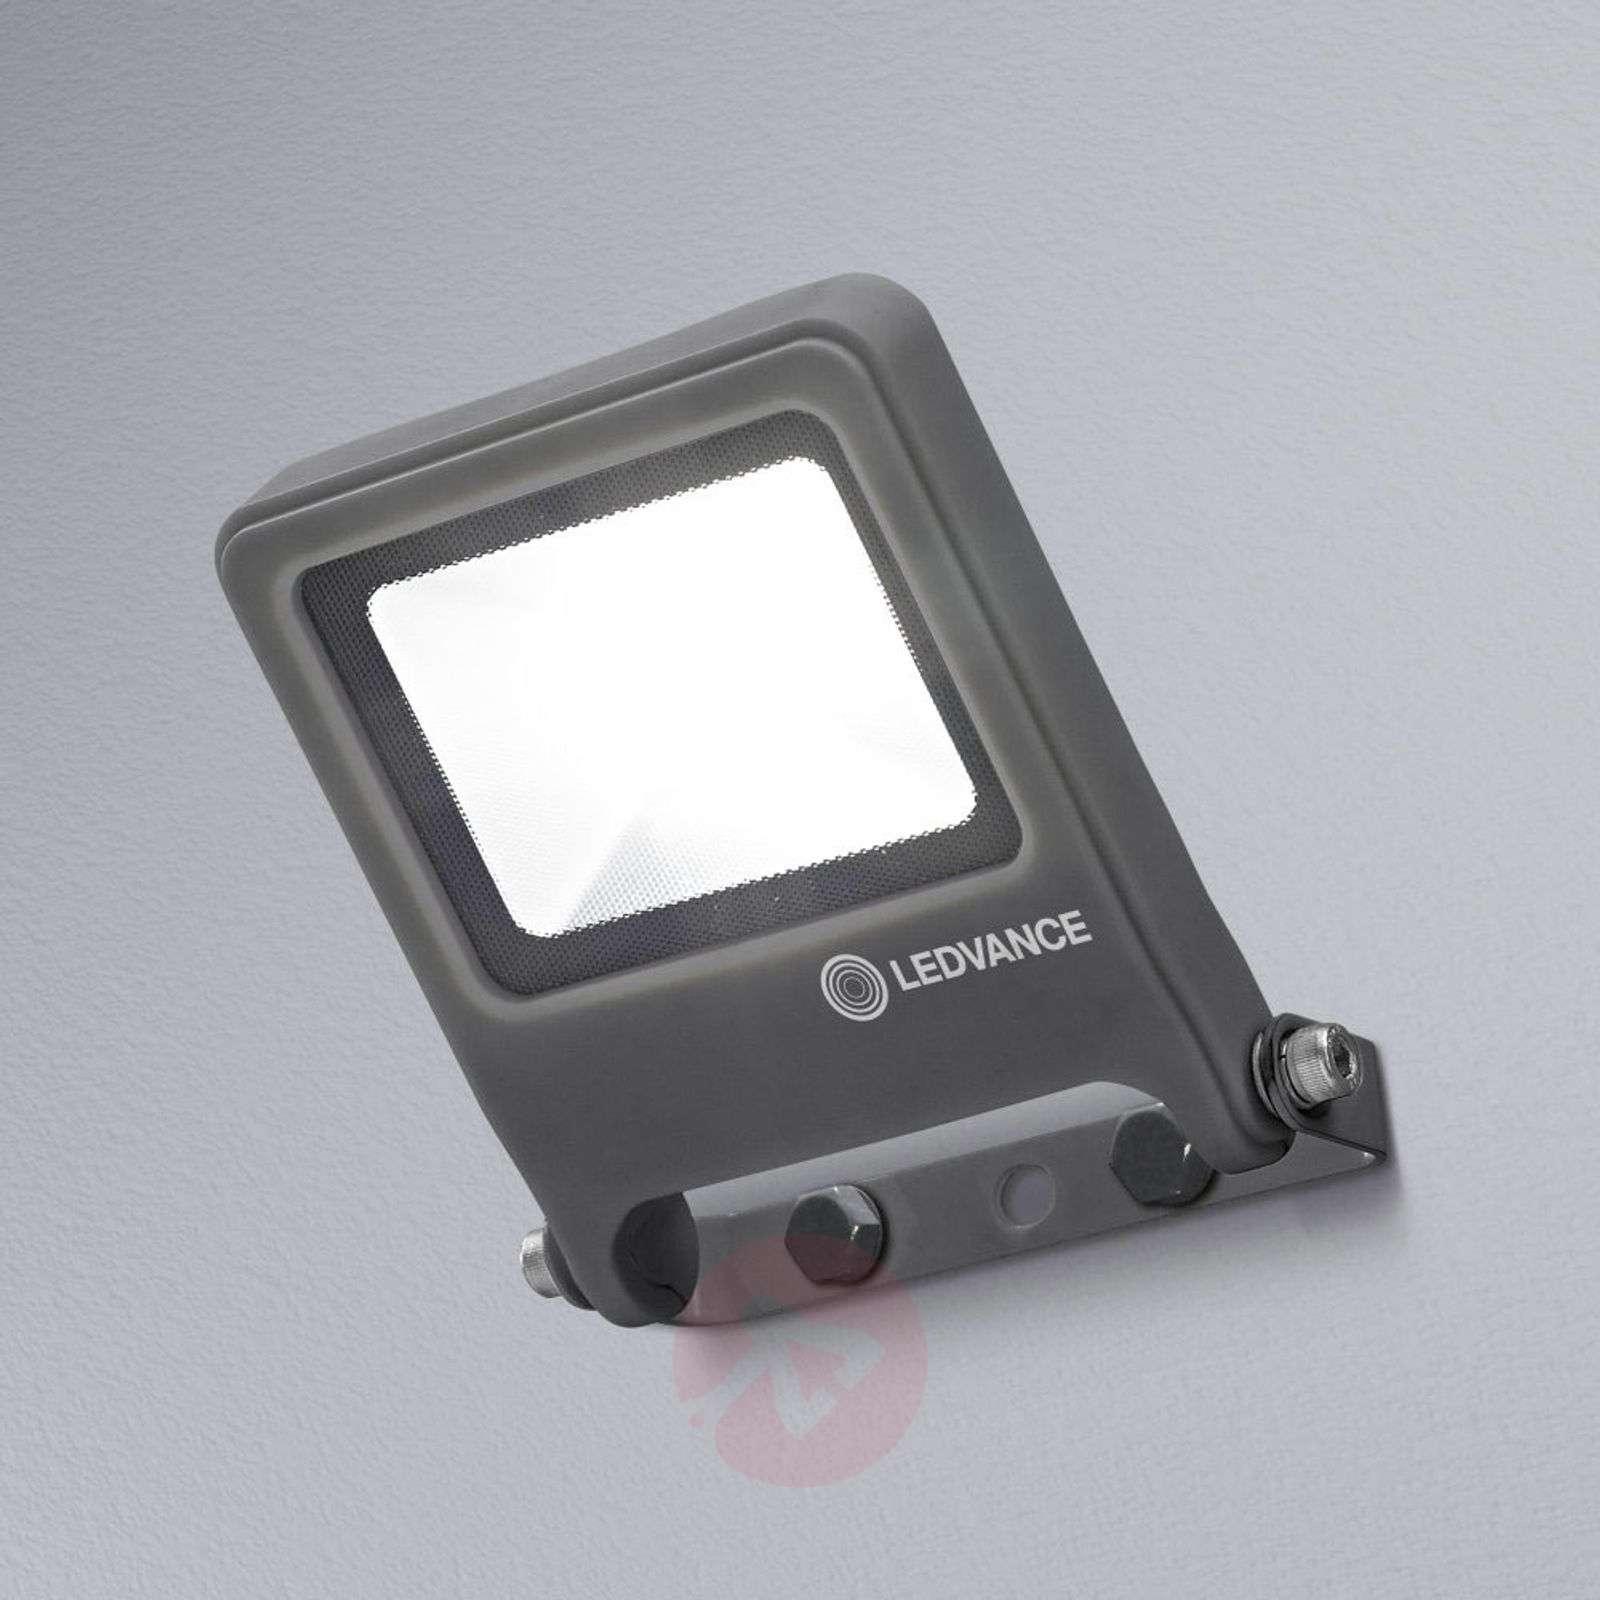 LEDVANCE Endura Floodlight LED-kohdevalaisin 10W-6106041-01